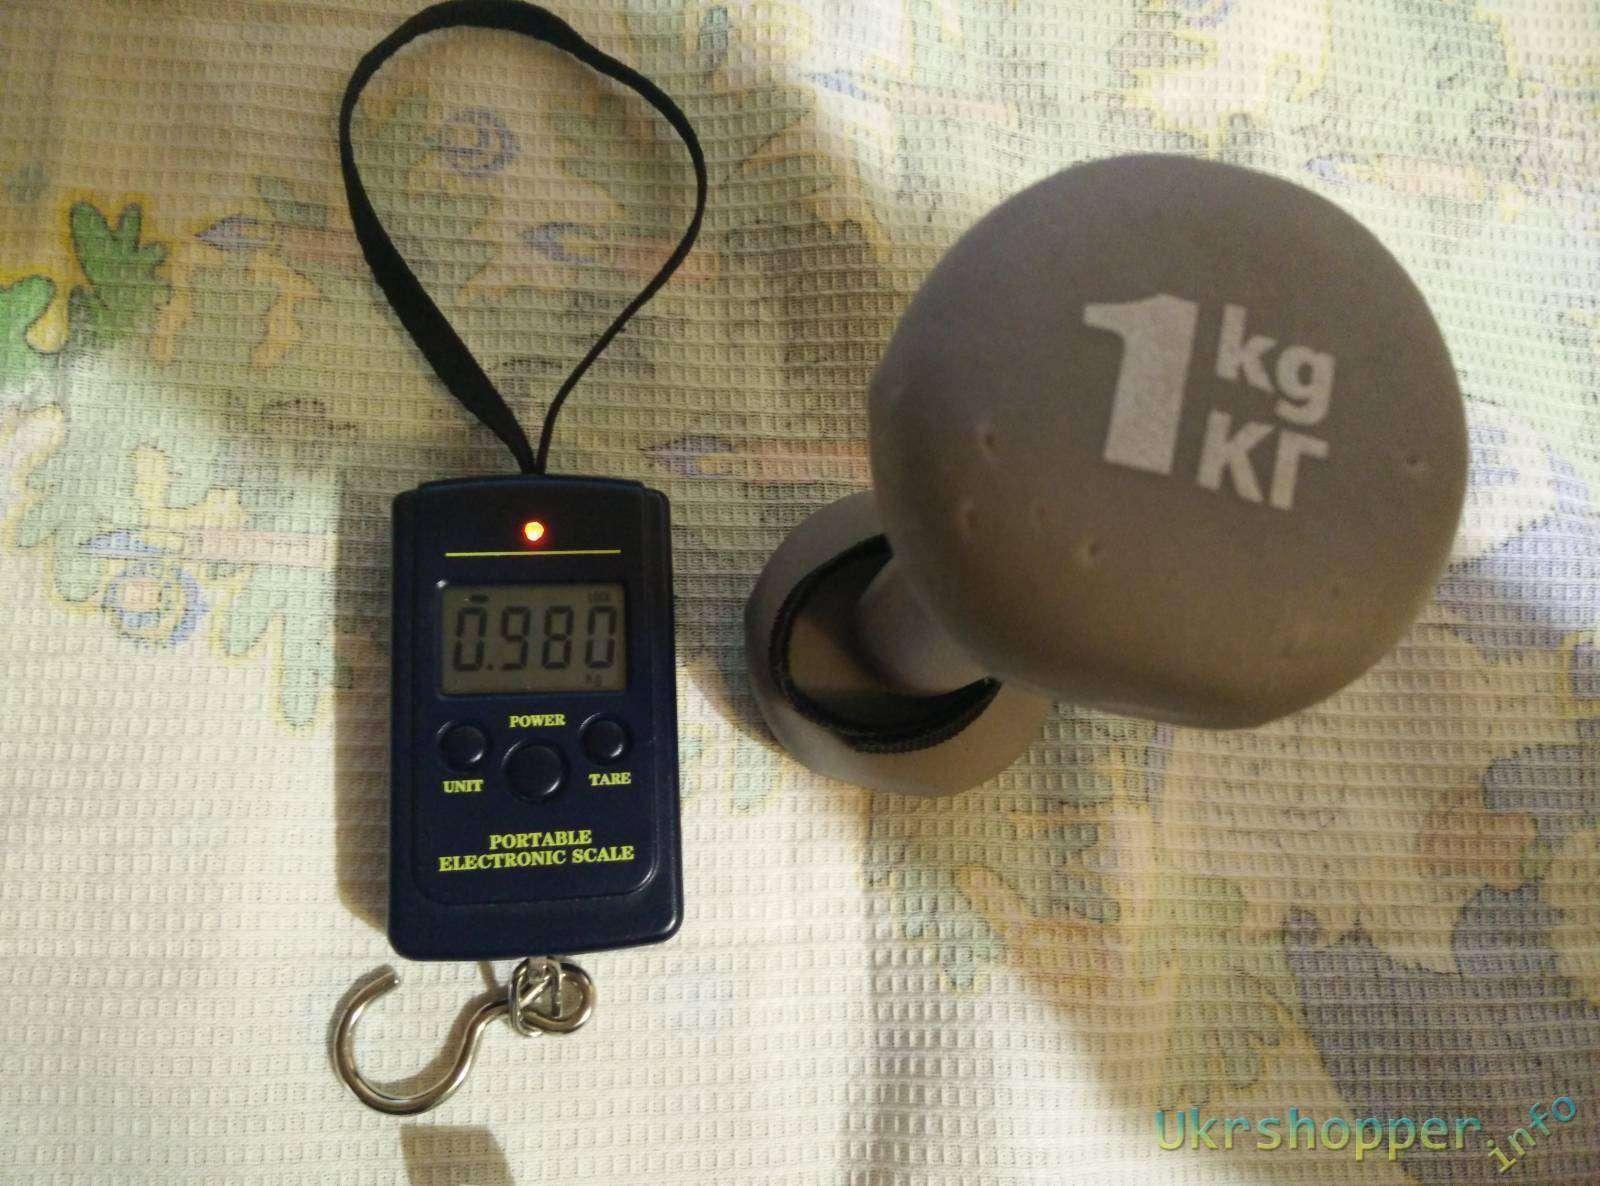 EachBuyer: Карманный электронный безмен  - наверное самый необходимый прибор для похода на базар